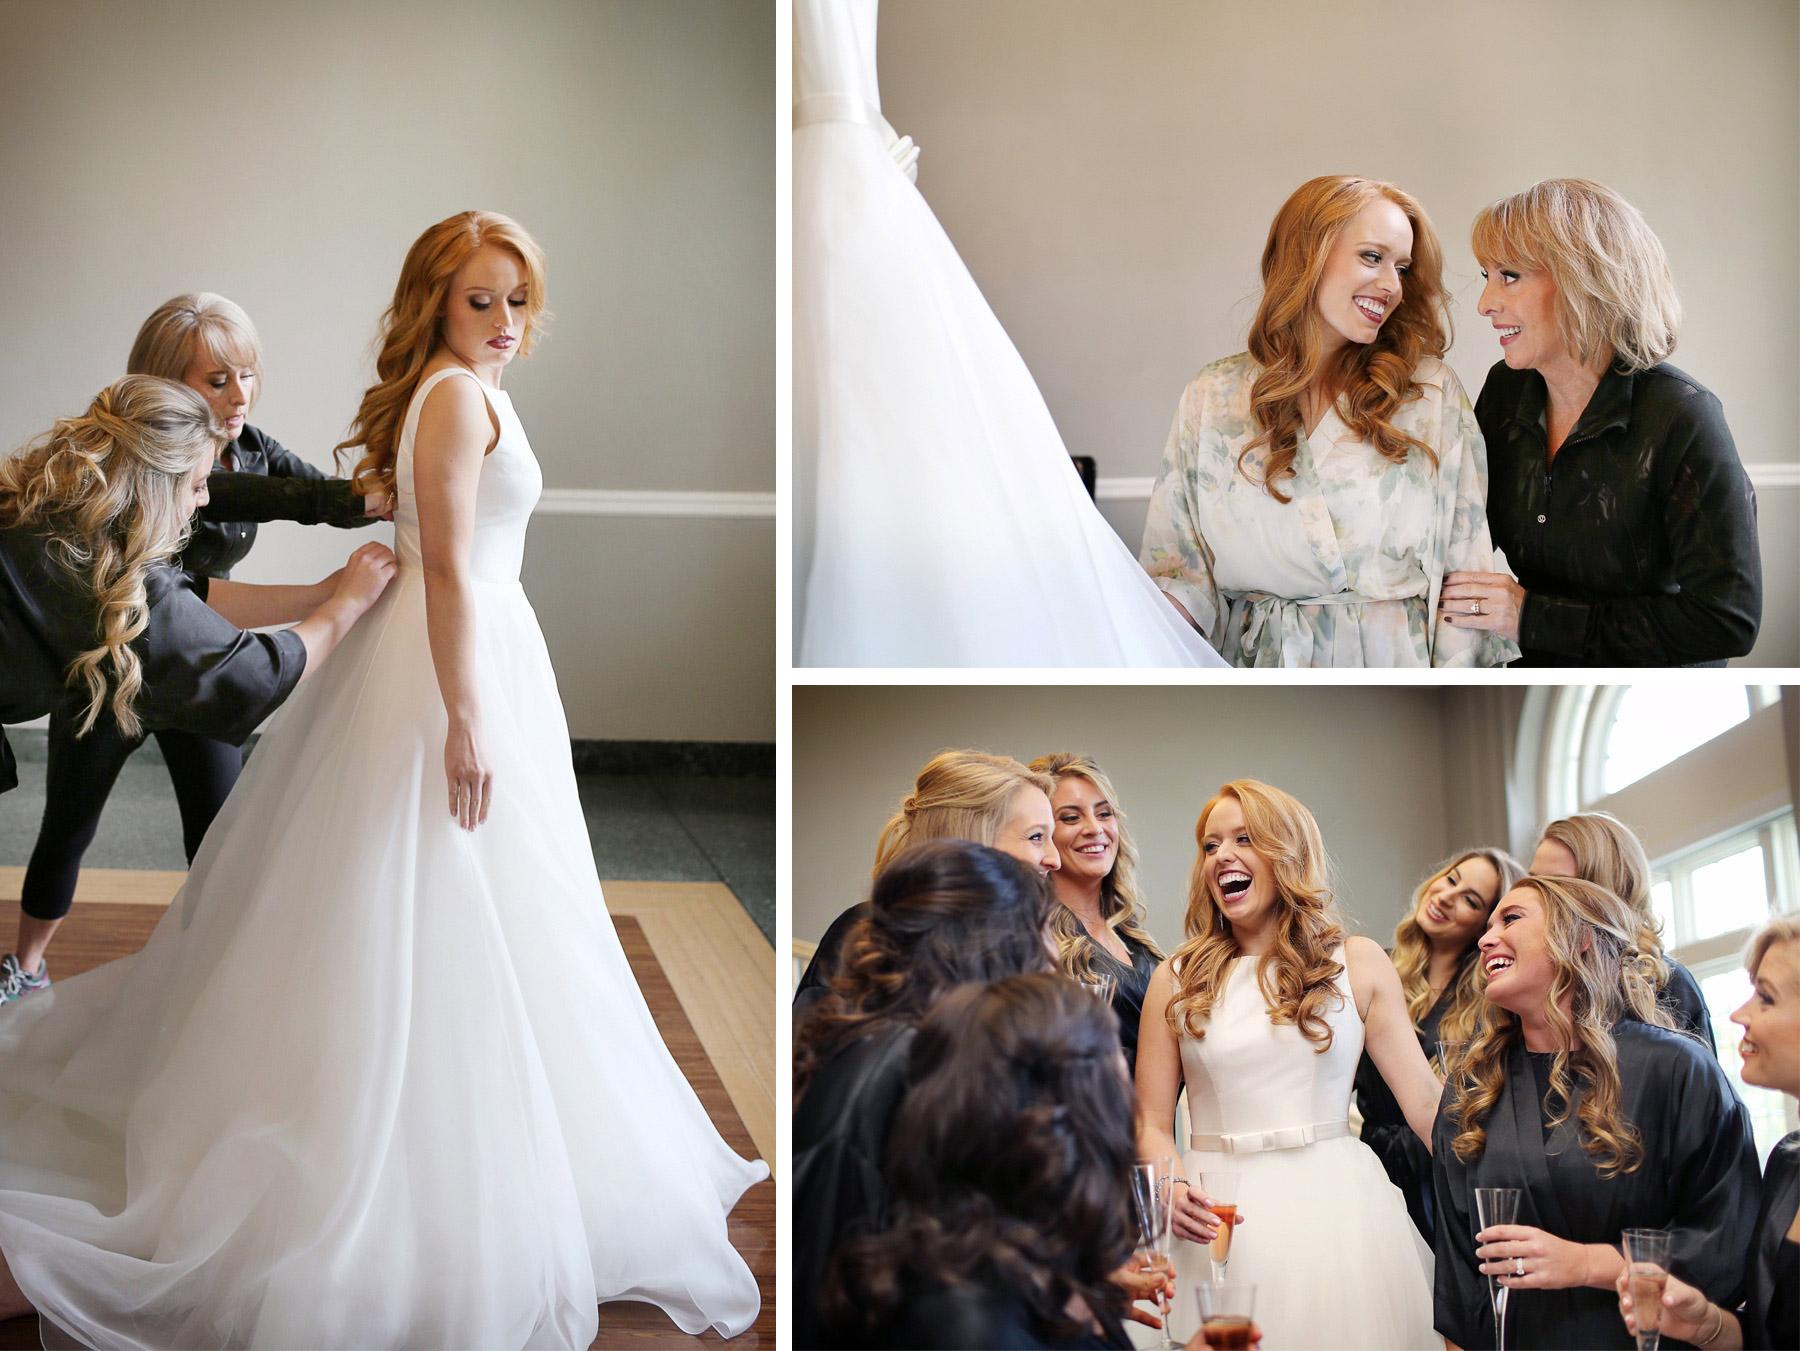 02-Minneapolis-Minnesota-Wedding-Photographer-by-Andrew-Vick-Photography-Fall-Autumn-Calhoun-Beach-Club-Getting-Ready-Bride-Mother-Parents-Bridesmaids-Dress-Kristy-and-Jack.jpg